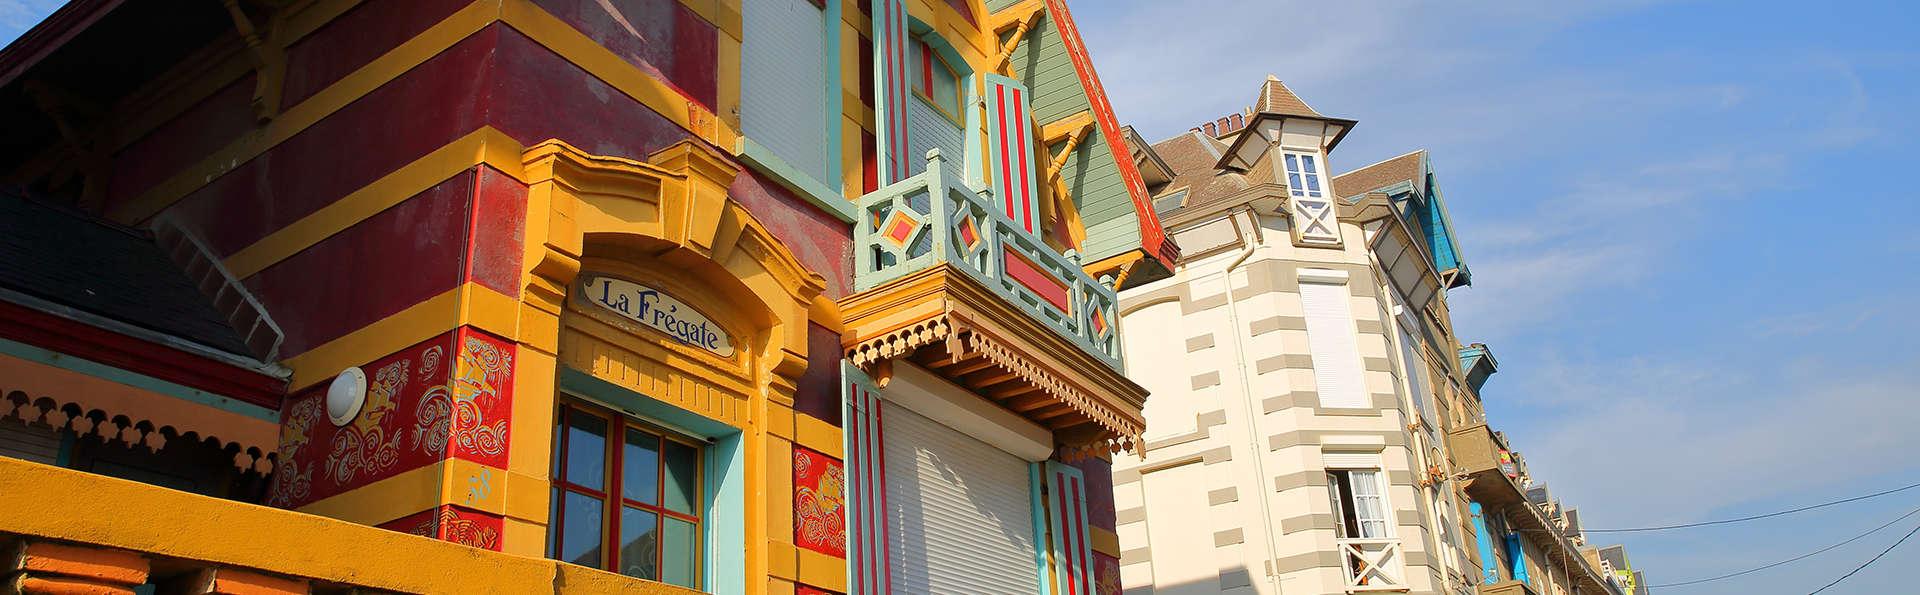 Hôtel Restaurant Le Carnot - Edit_wimereux2.jpg